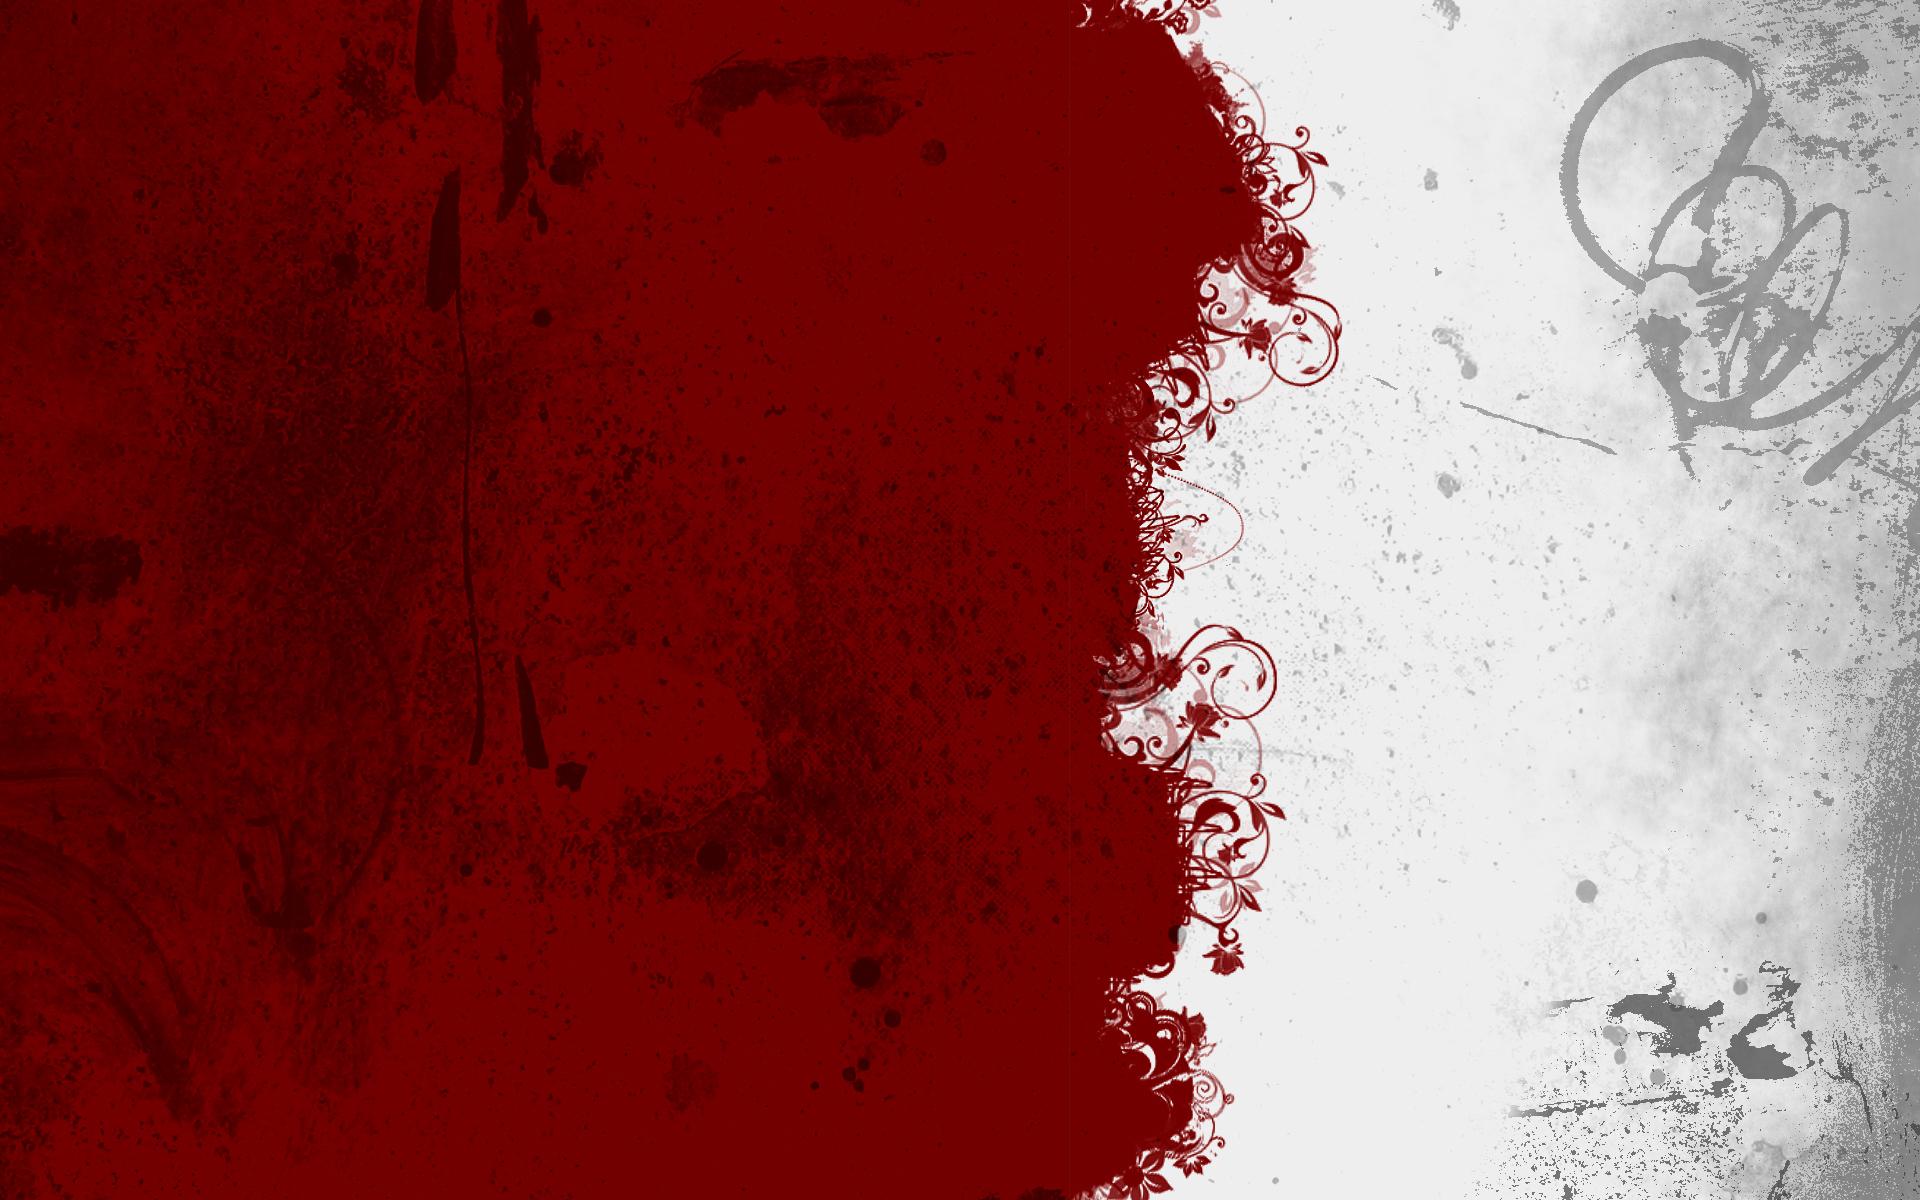 Black Red And White Wallpaper Wallpapersafari